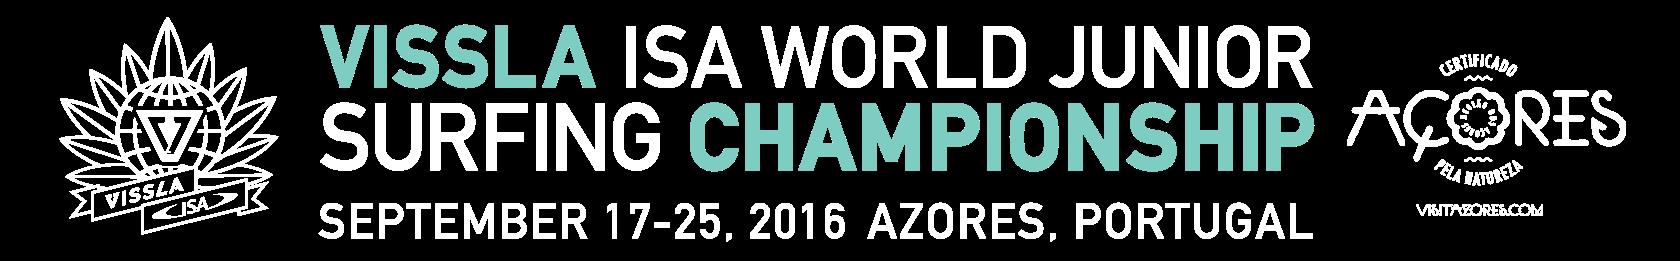 2016 VISSLA ISA World Junior Surfing Championship